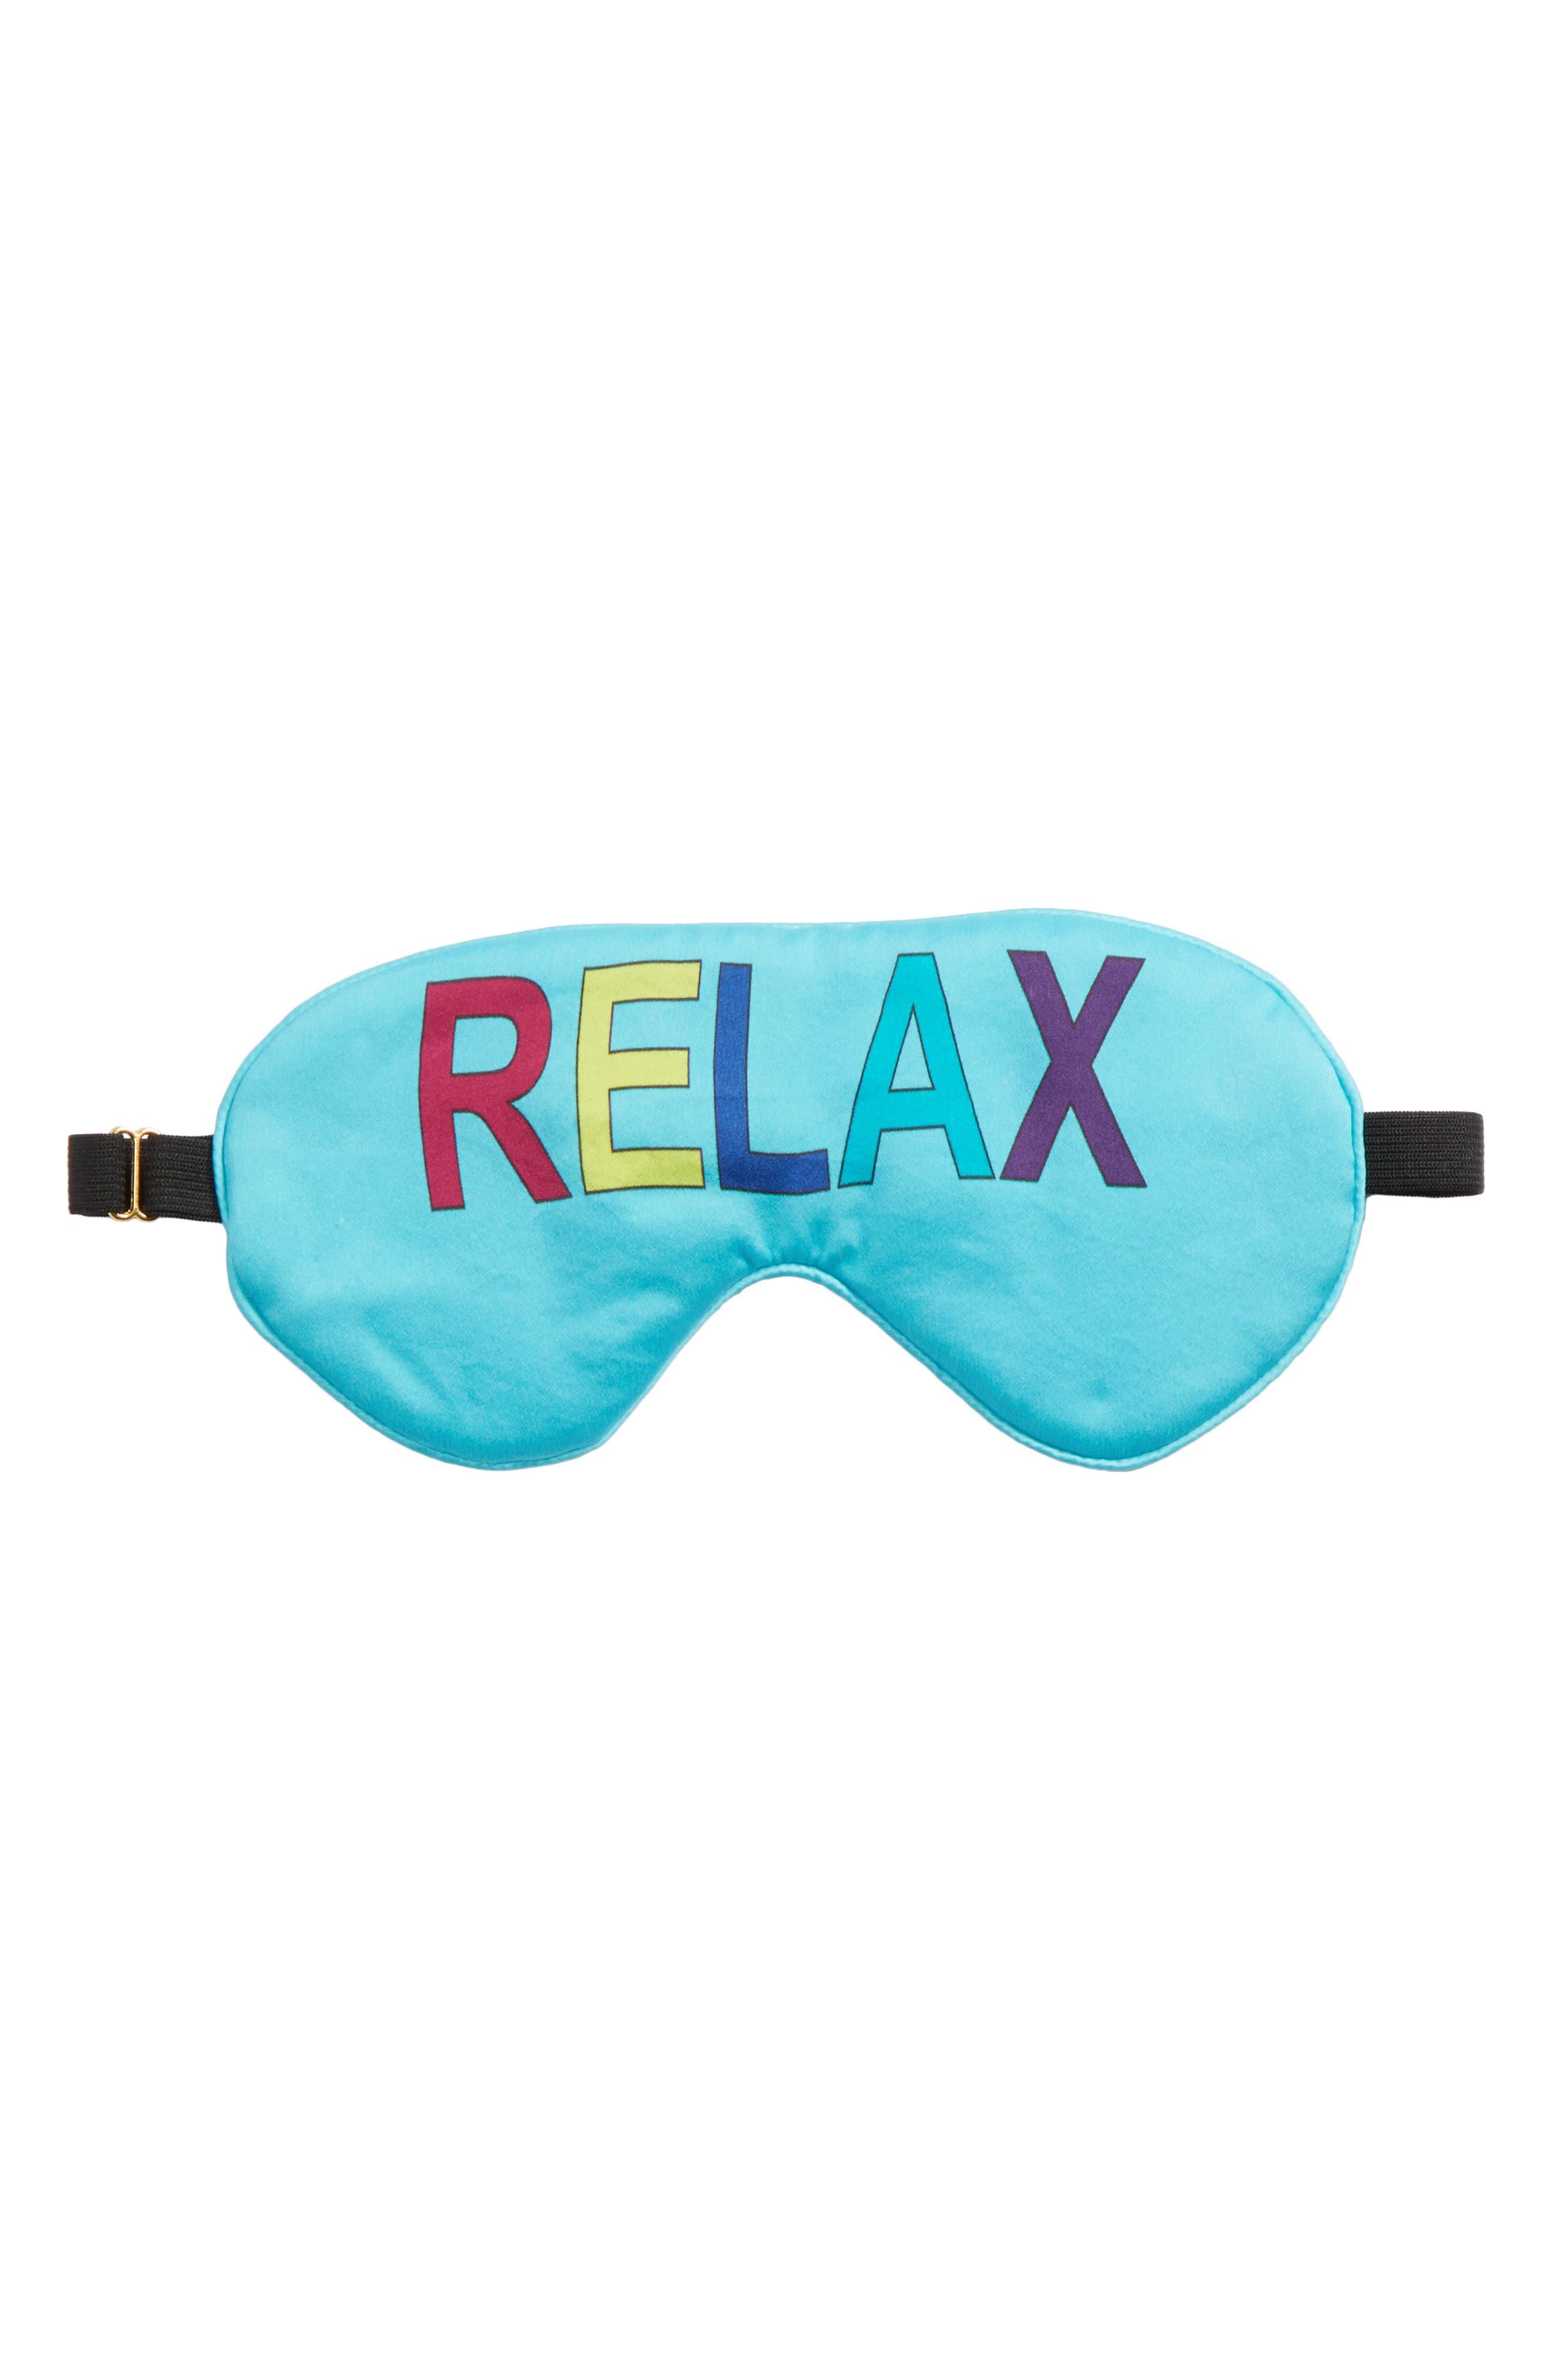 Relax Sleep Mask,                         Main,                         color, Breezy